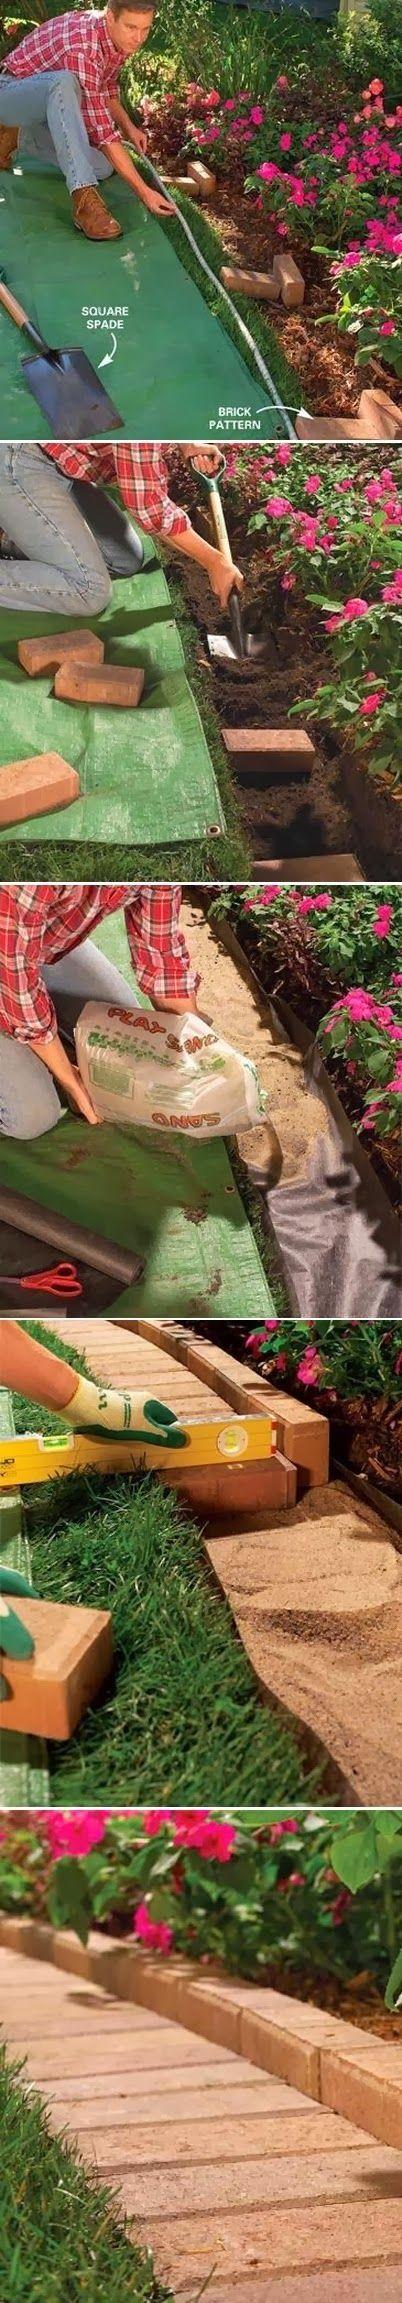 The Best Garden Bed Edging Tips | Garden | Pinterest | Brick garden ...